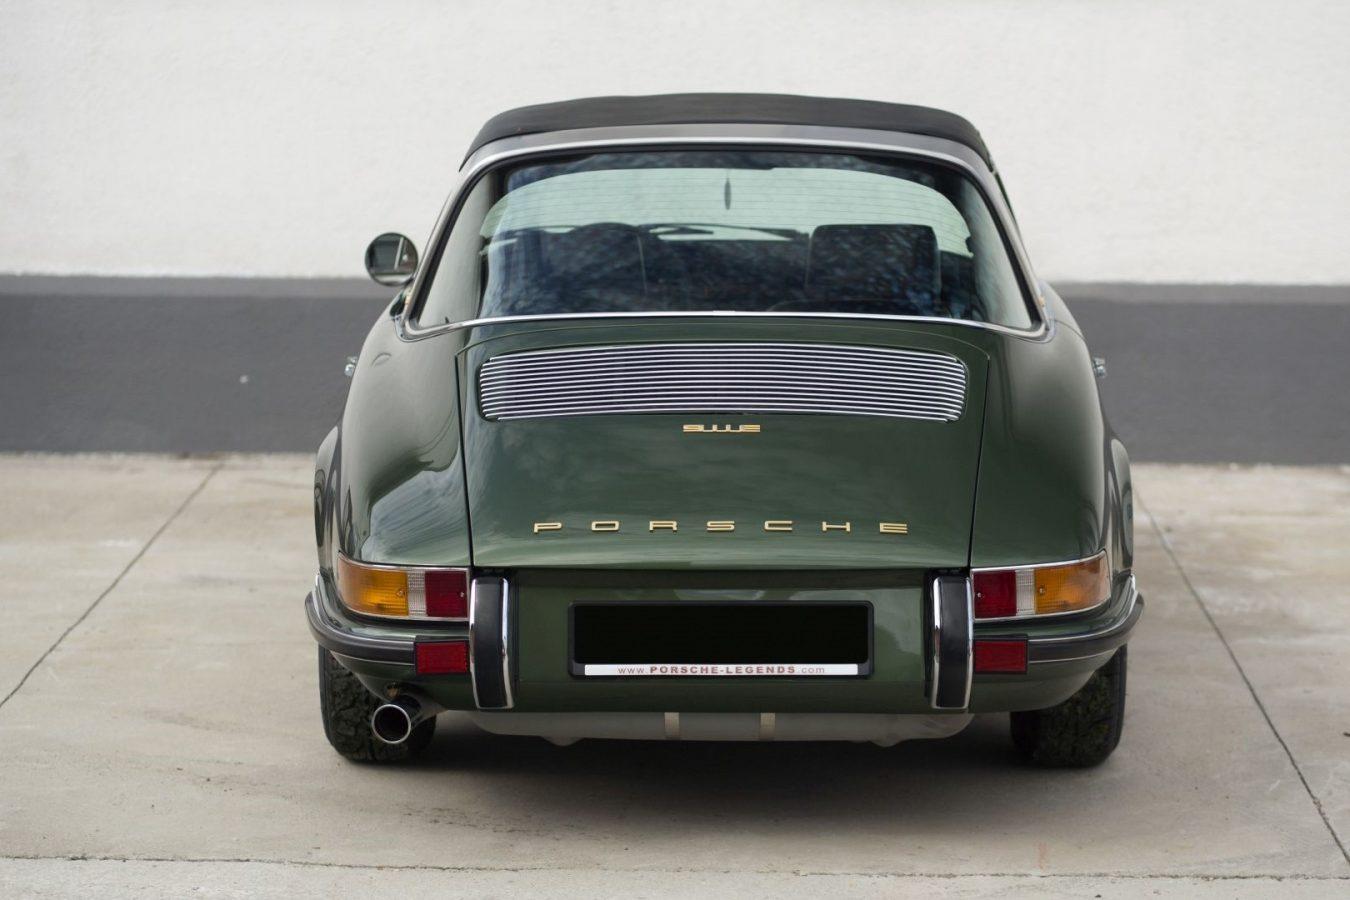 Dunkelgrüner Porsche 911E Targa von hinten